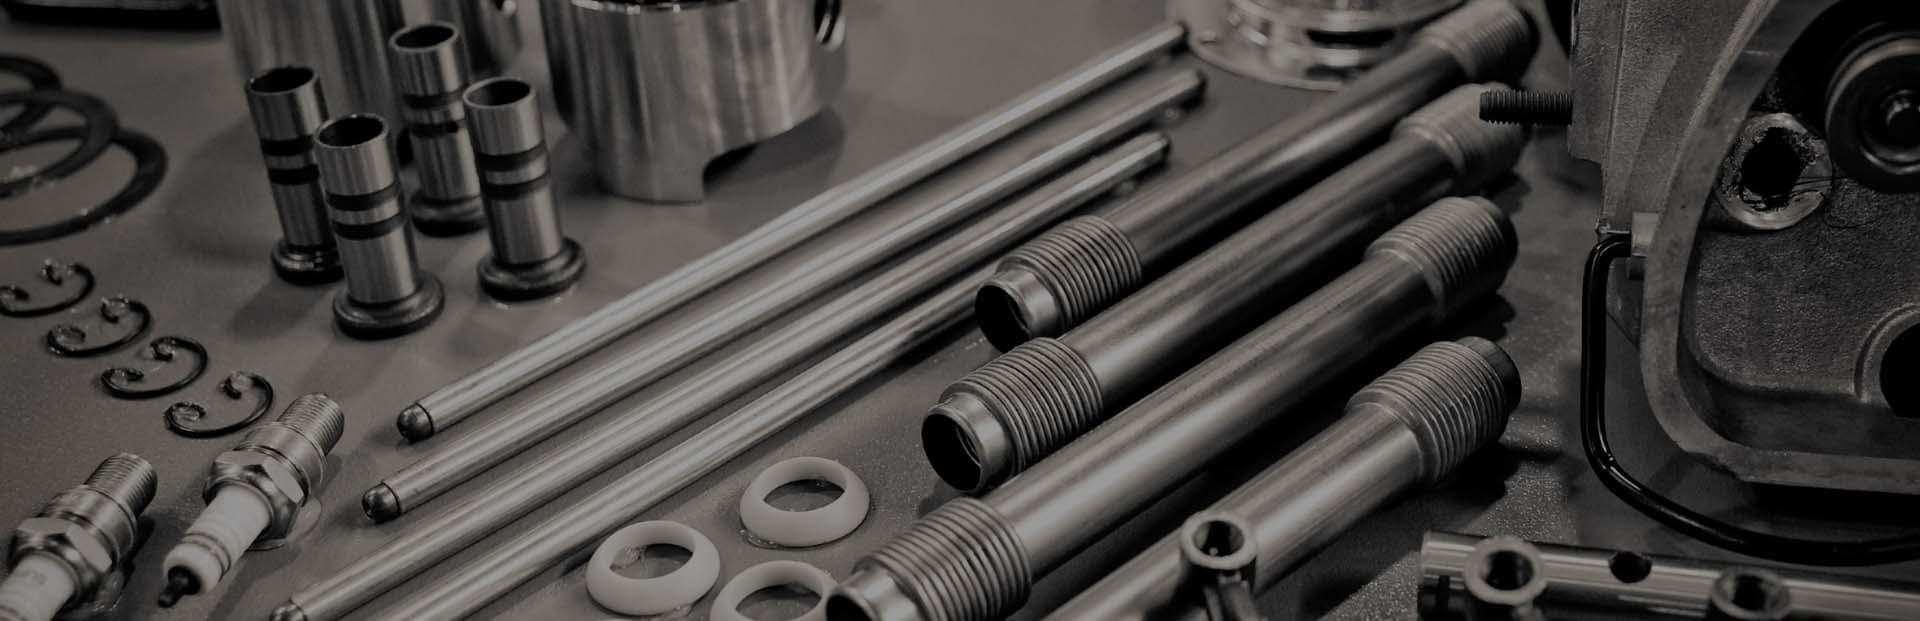 Acura OEM Program Vs Aftermarket Parts - Aftermarket acura parts